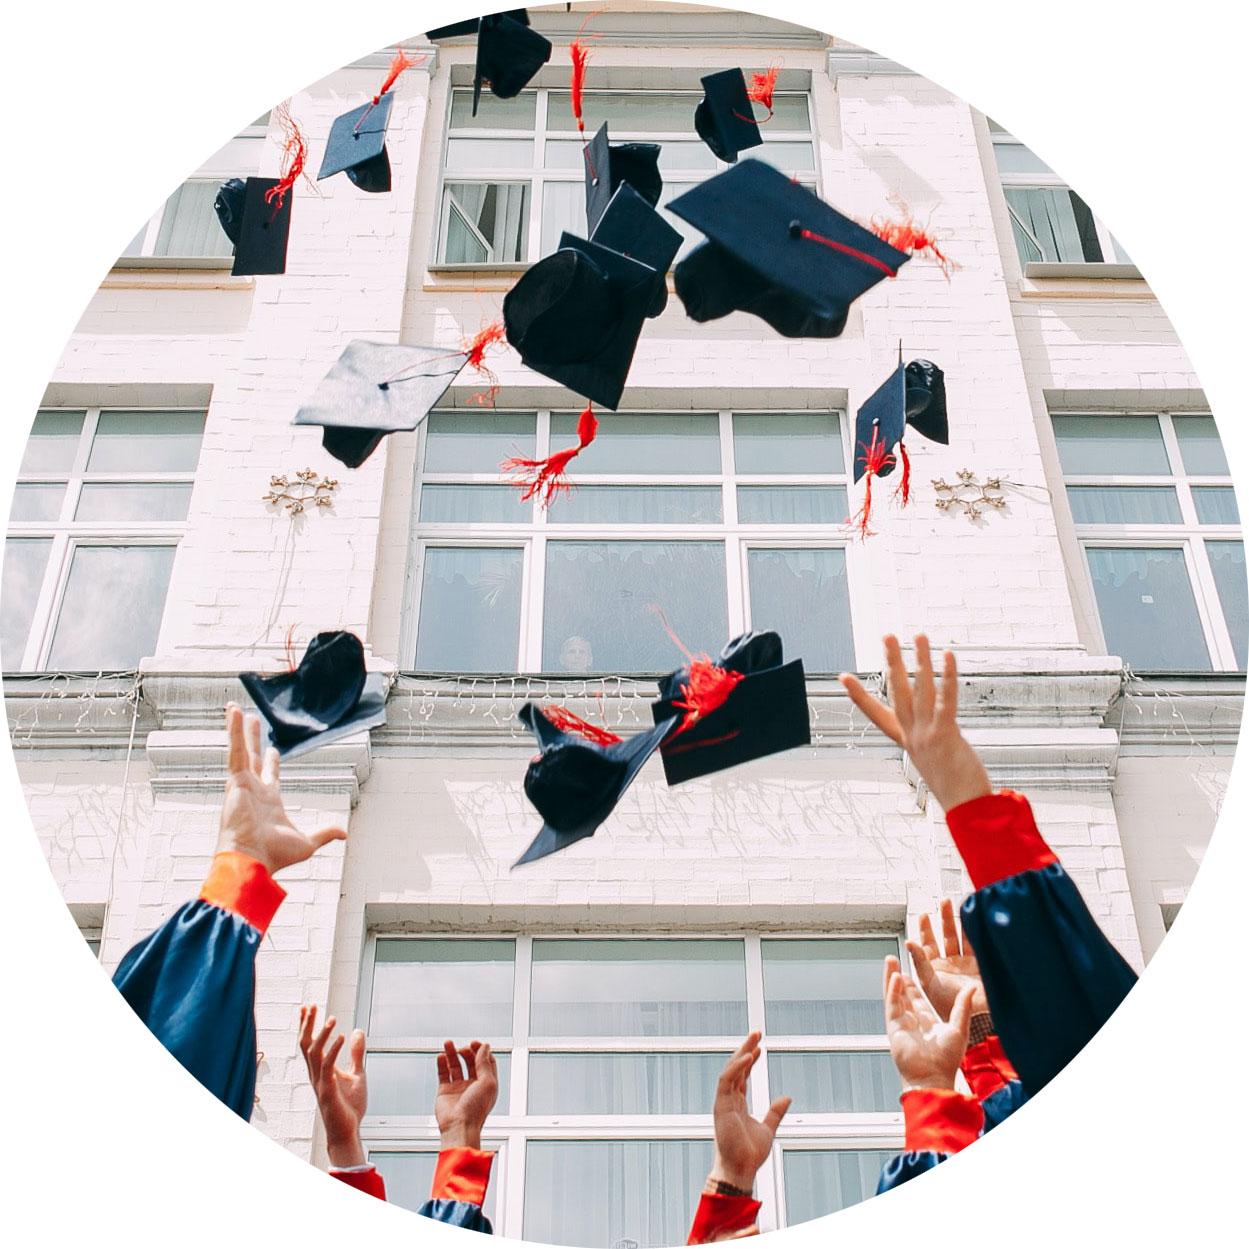 image of a university graduation